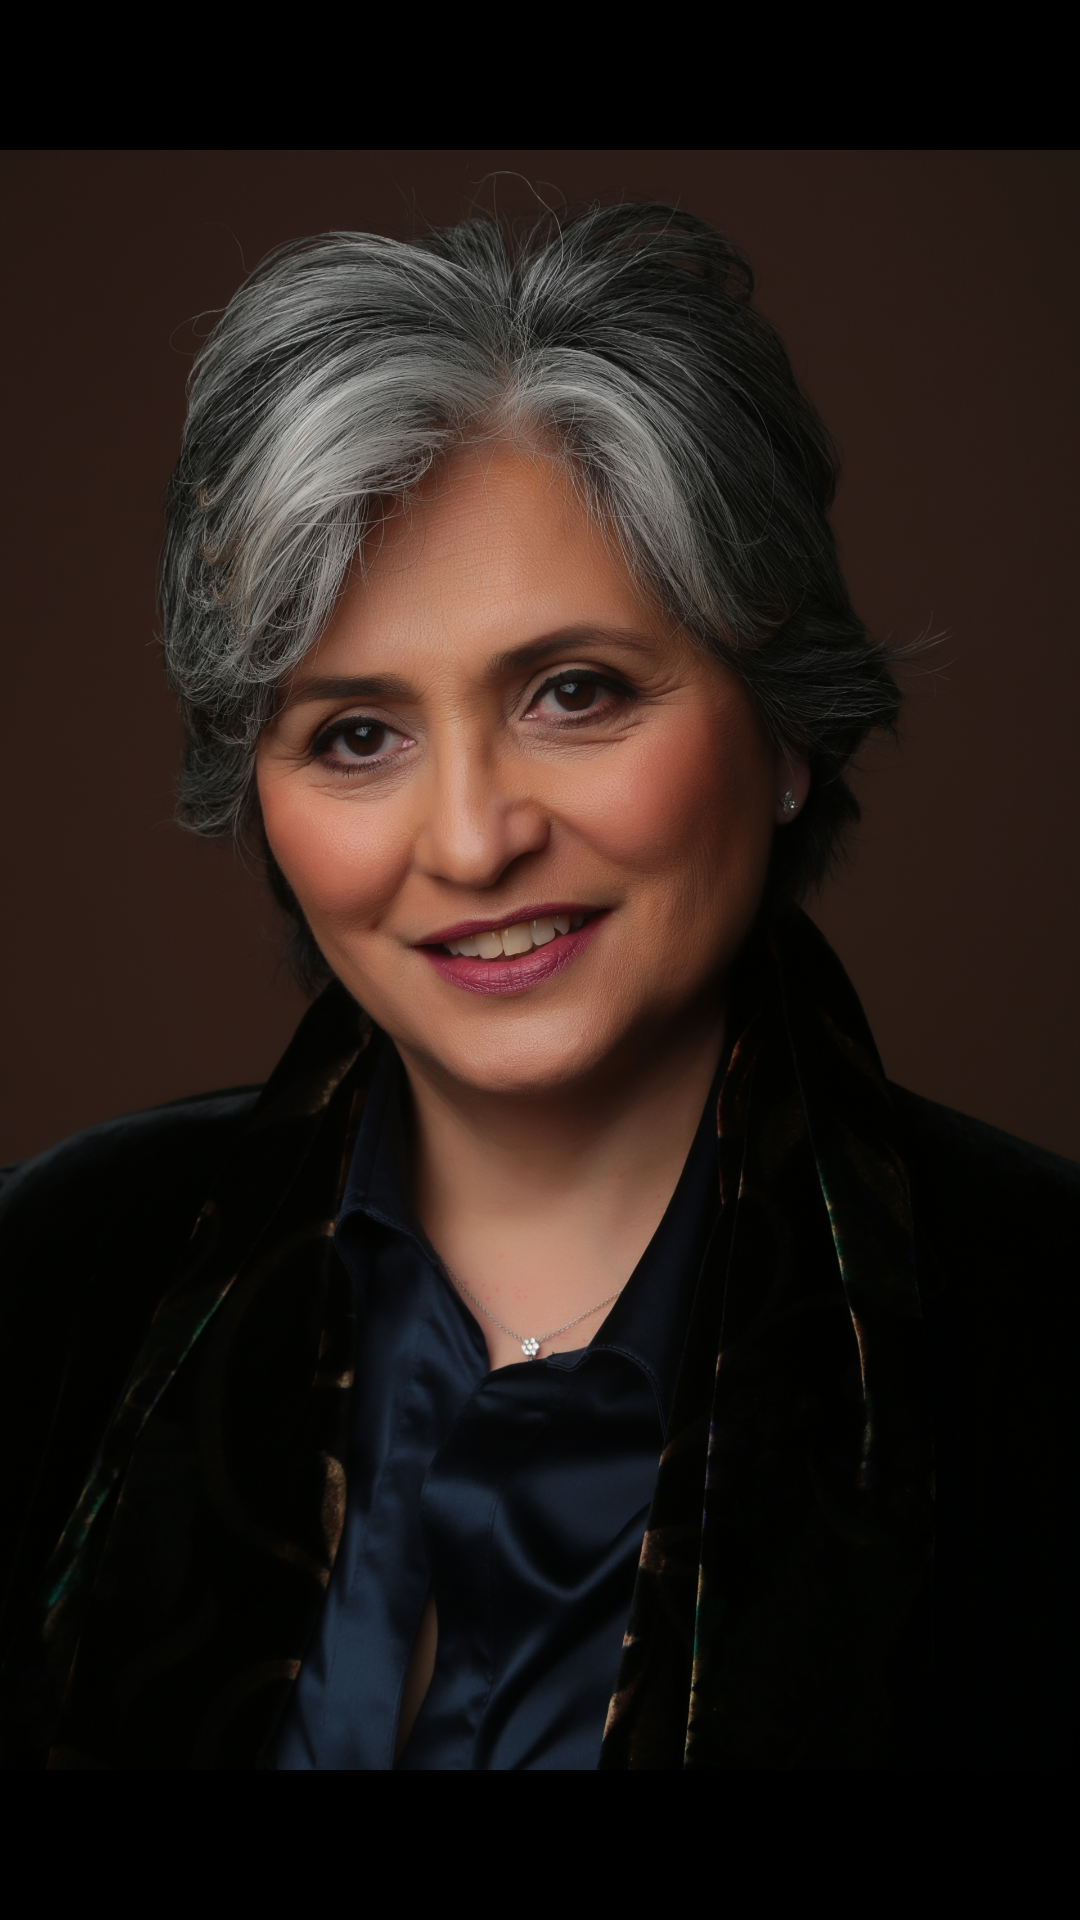 Shieva Alipour